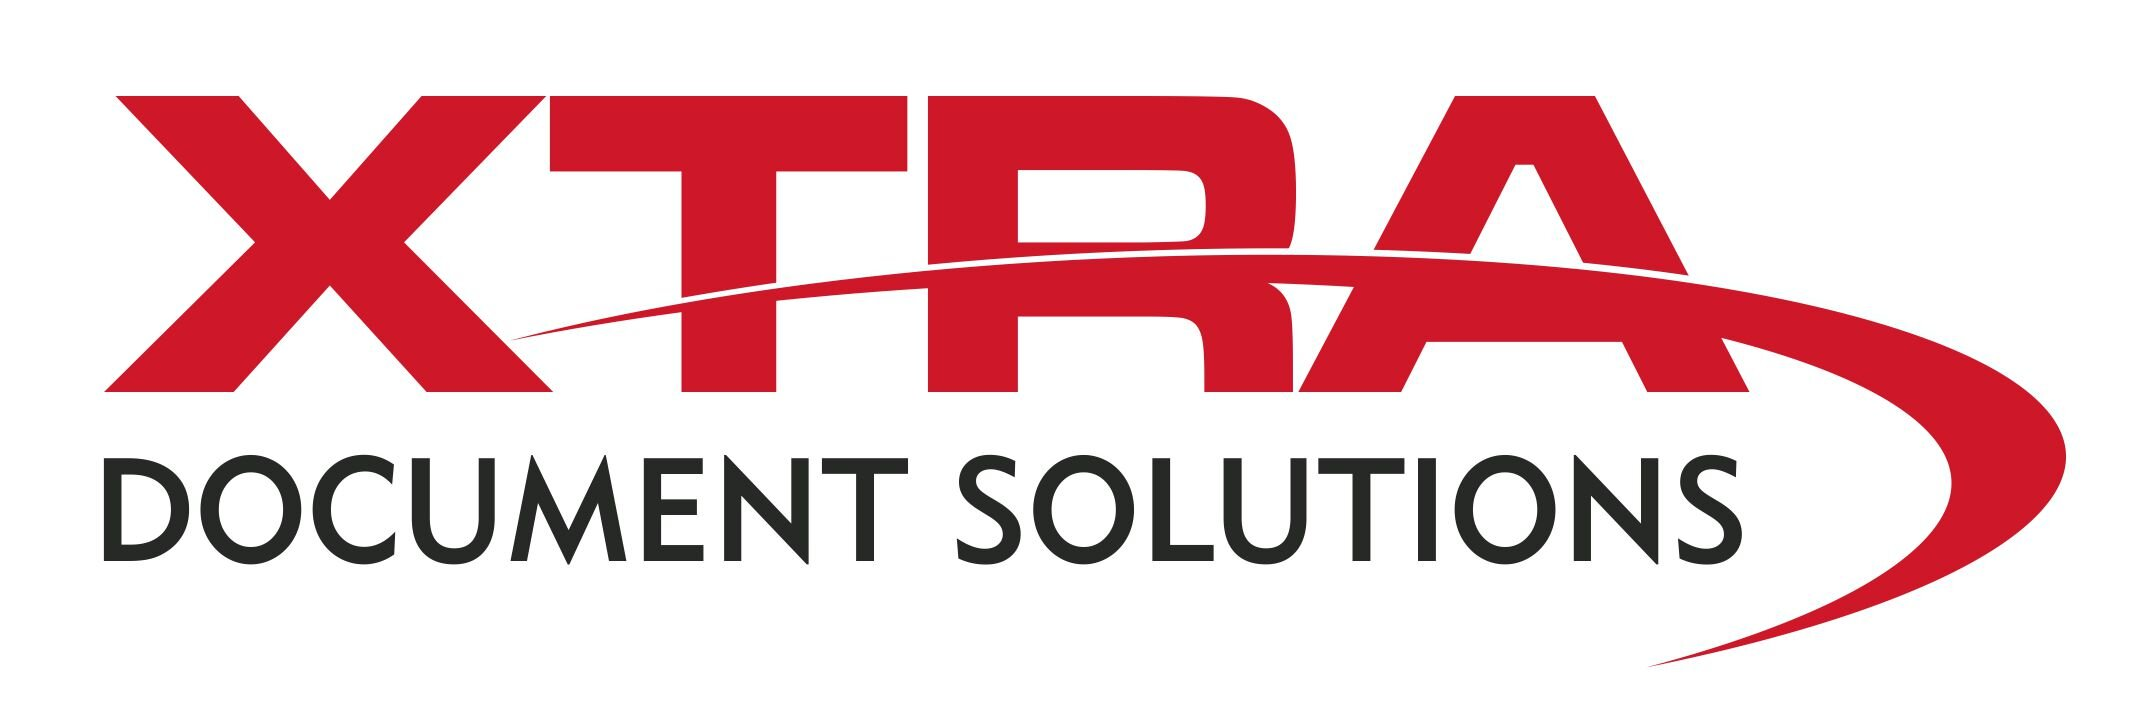 xtra document solutions.jpg